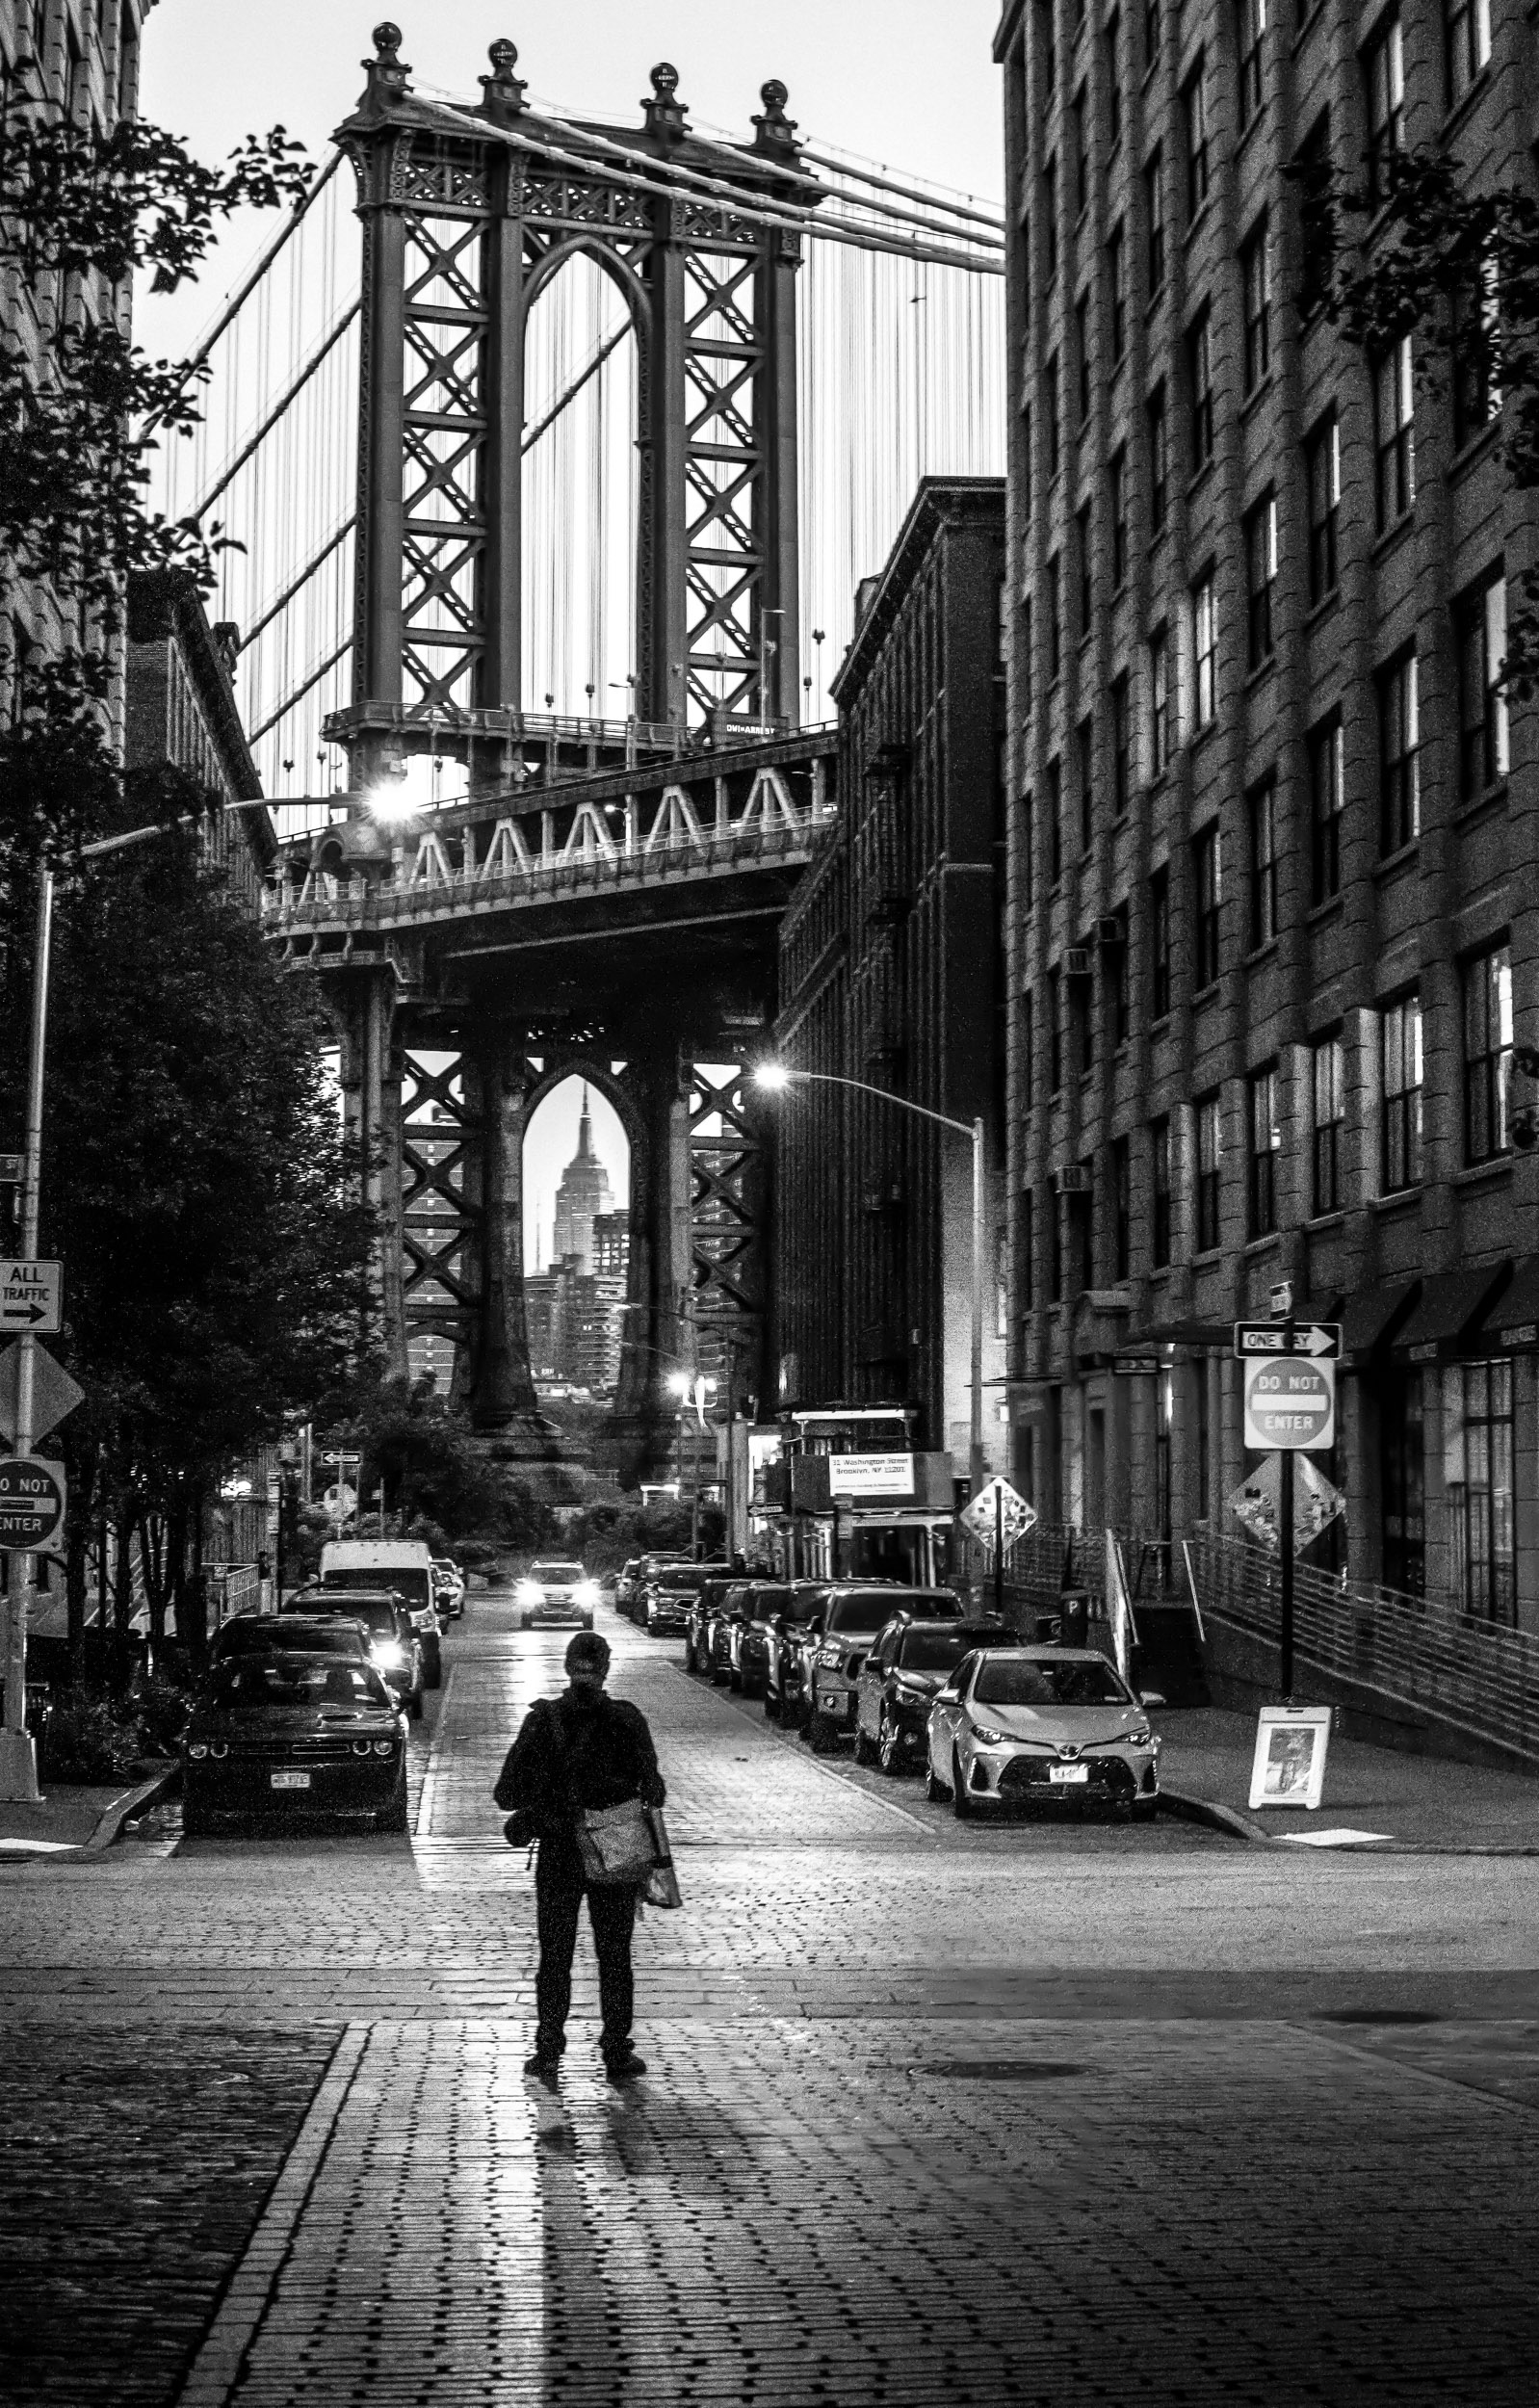 Paul Kenton, UK cityscape artist, plein air painting at Manhattan Bridge, New York in preparation for new original paintings